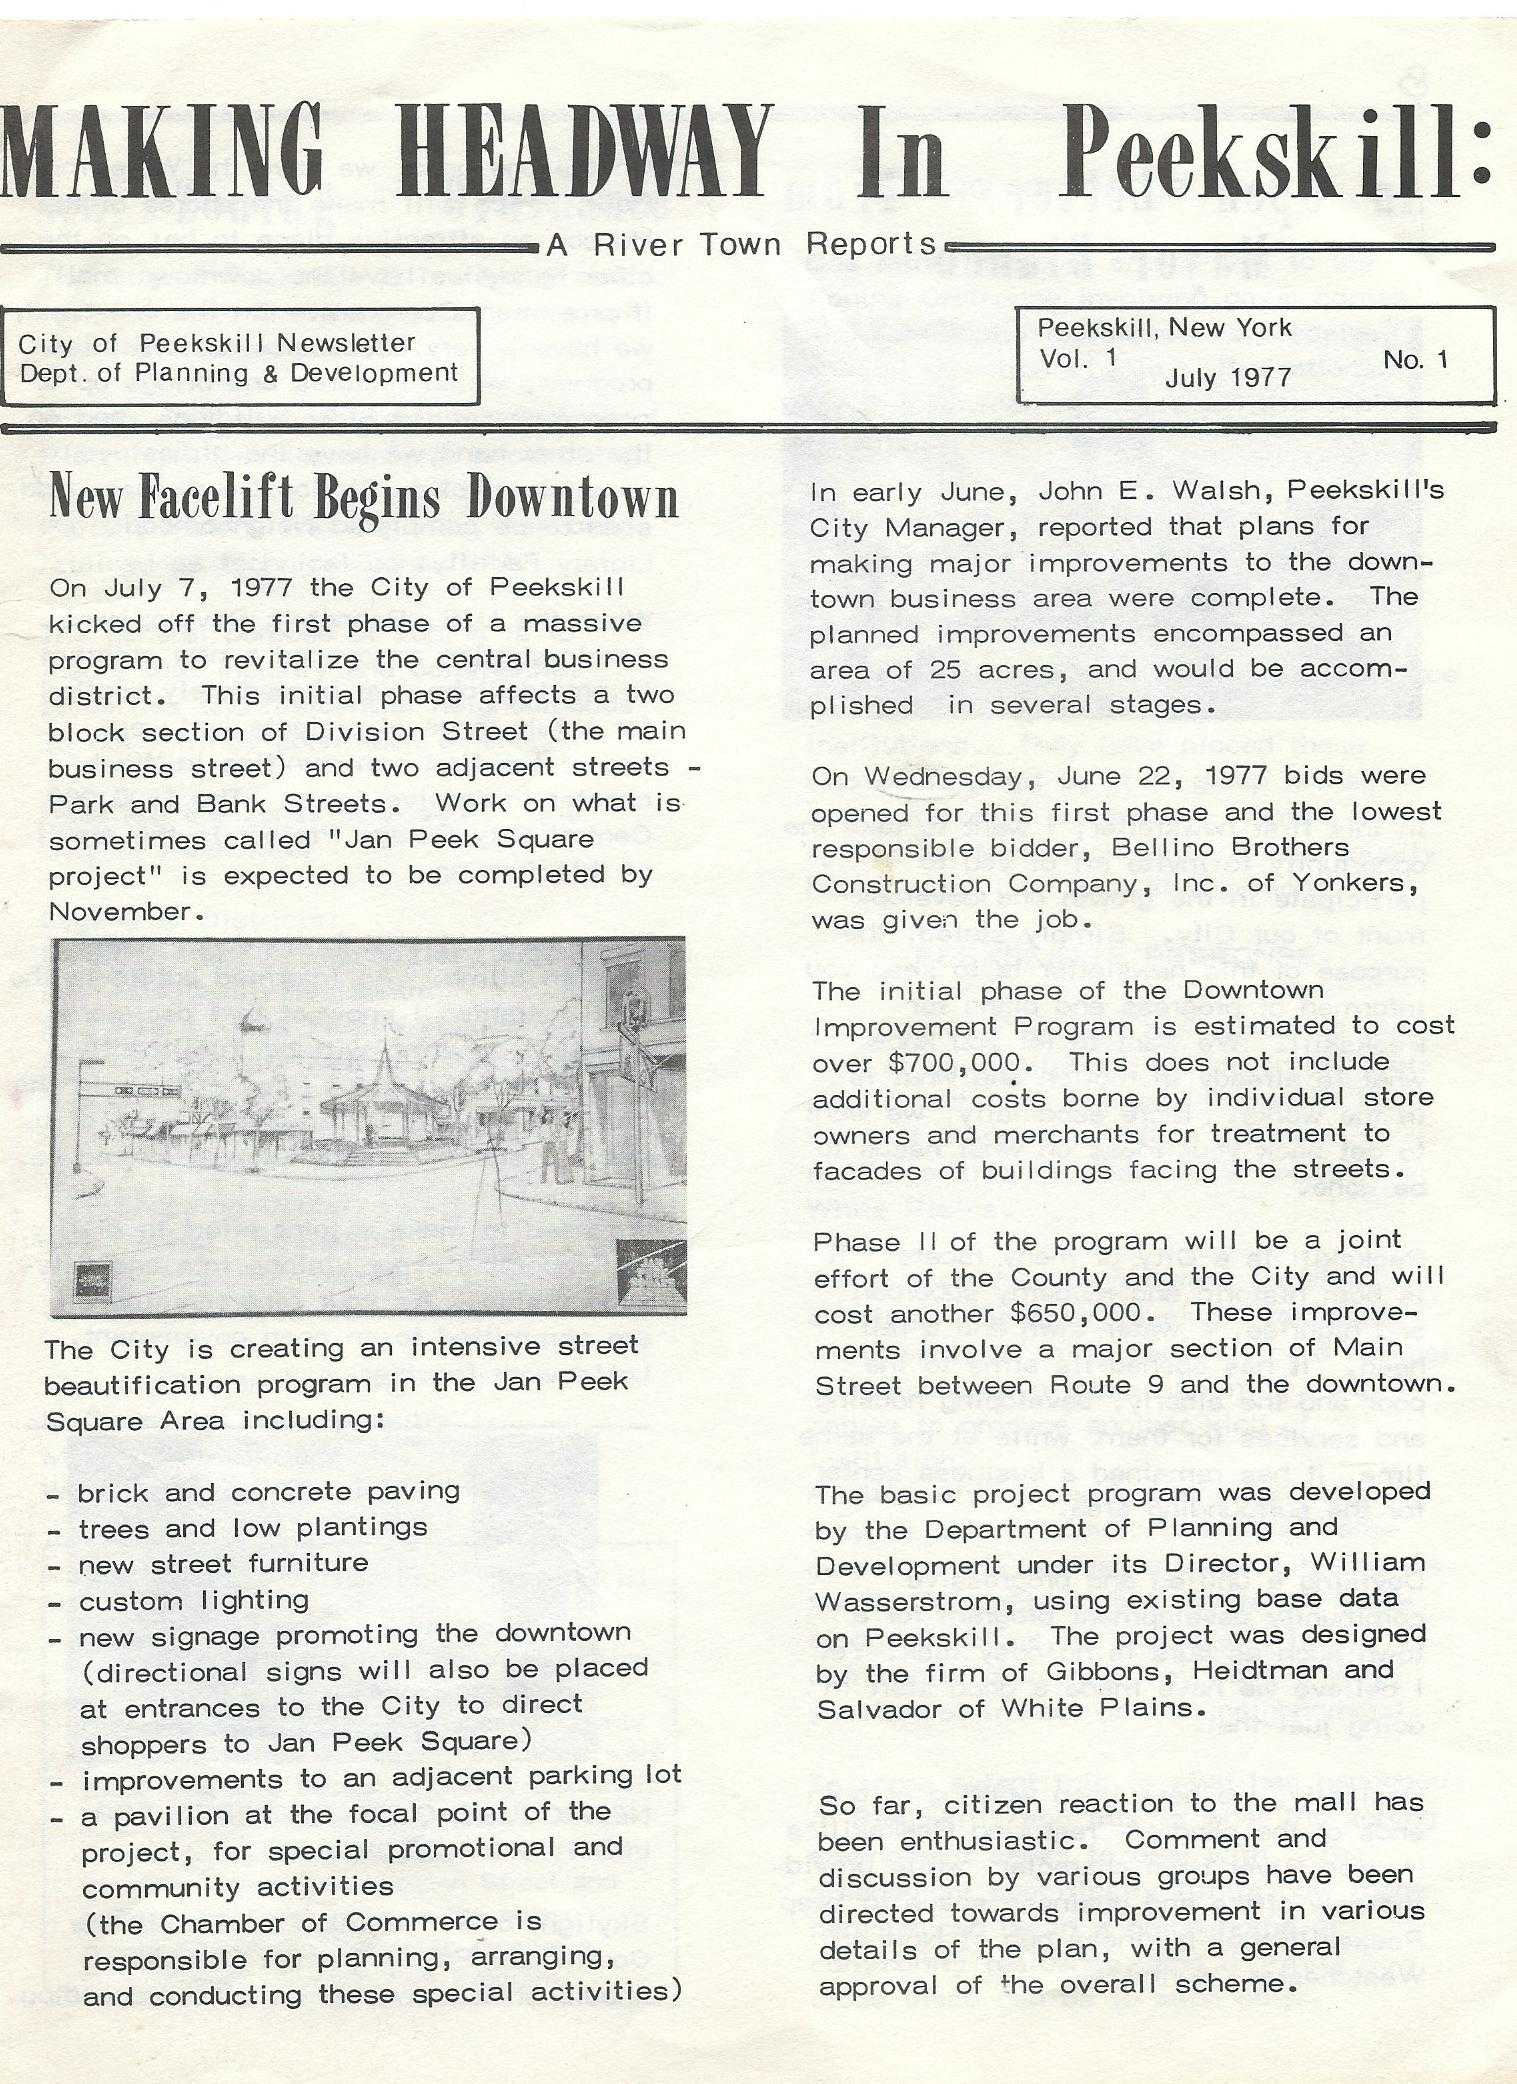 Newsletter from 1977